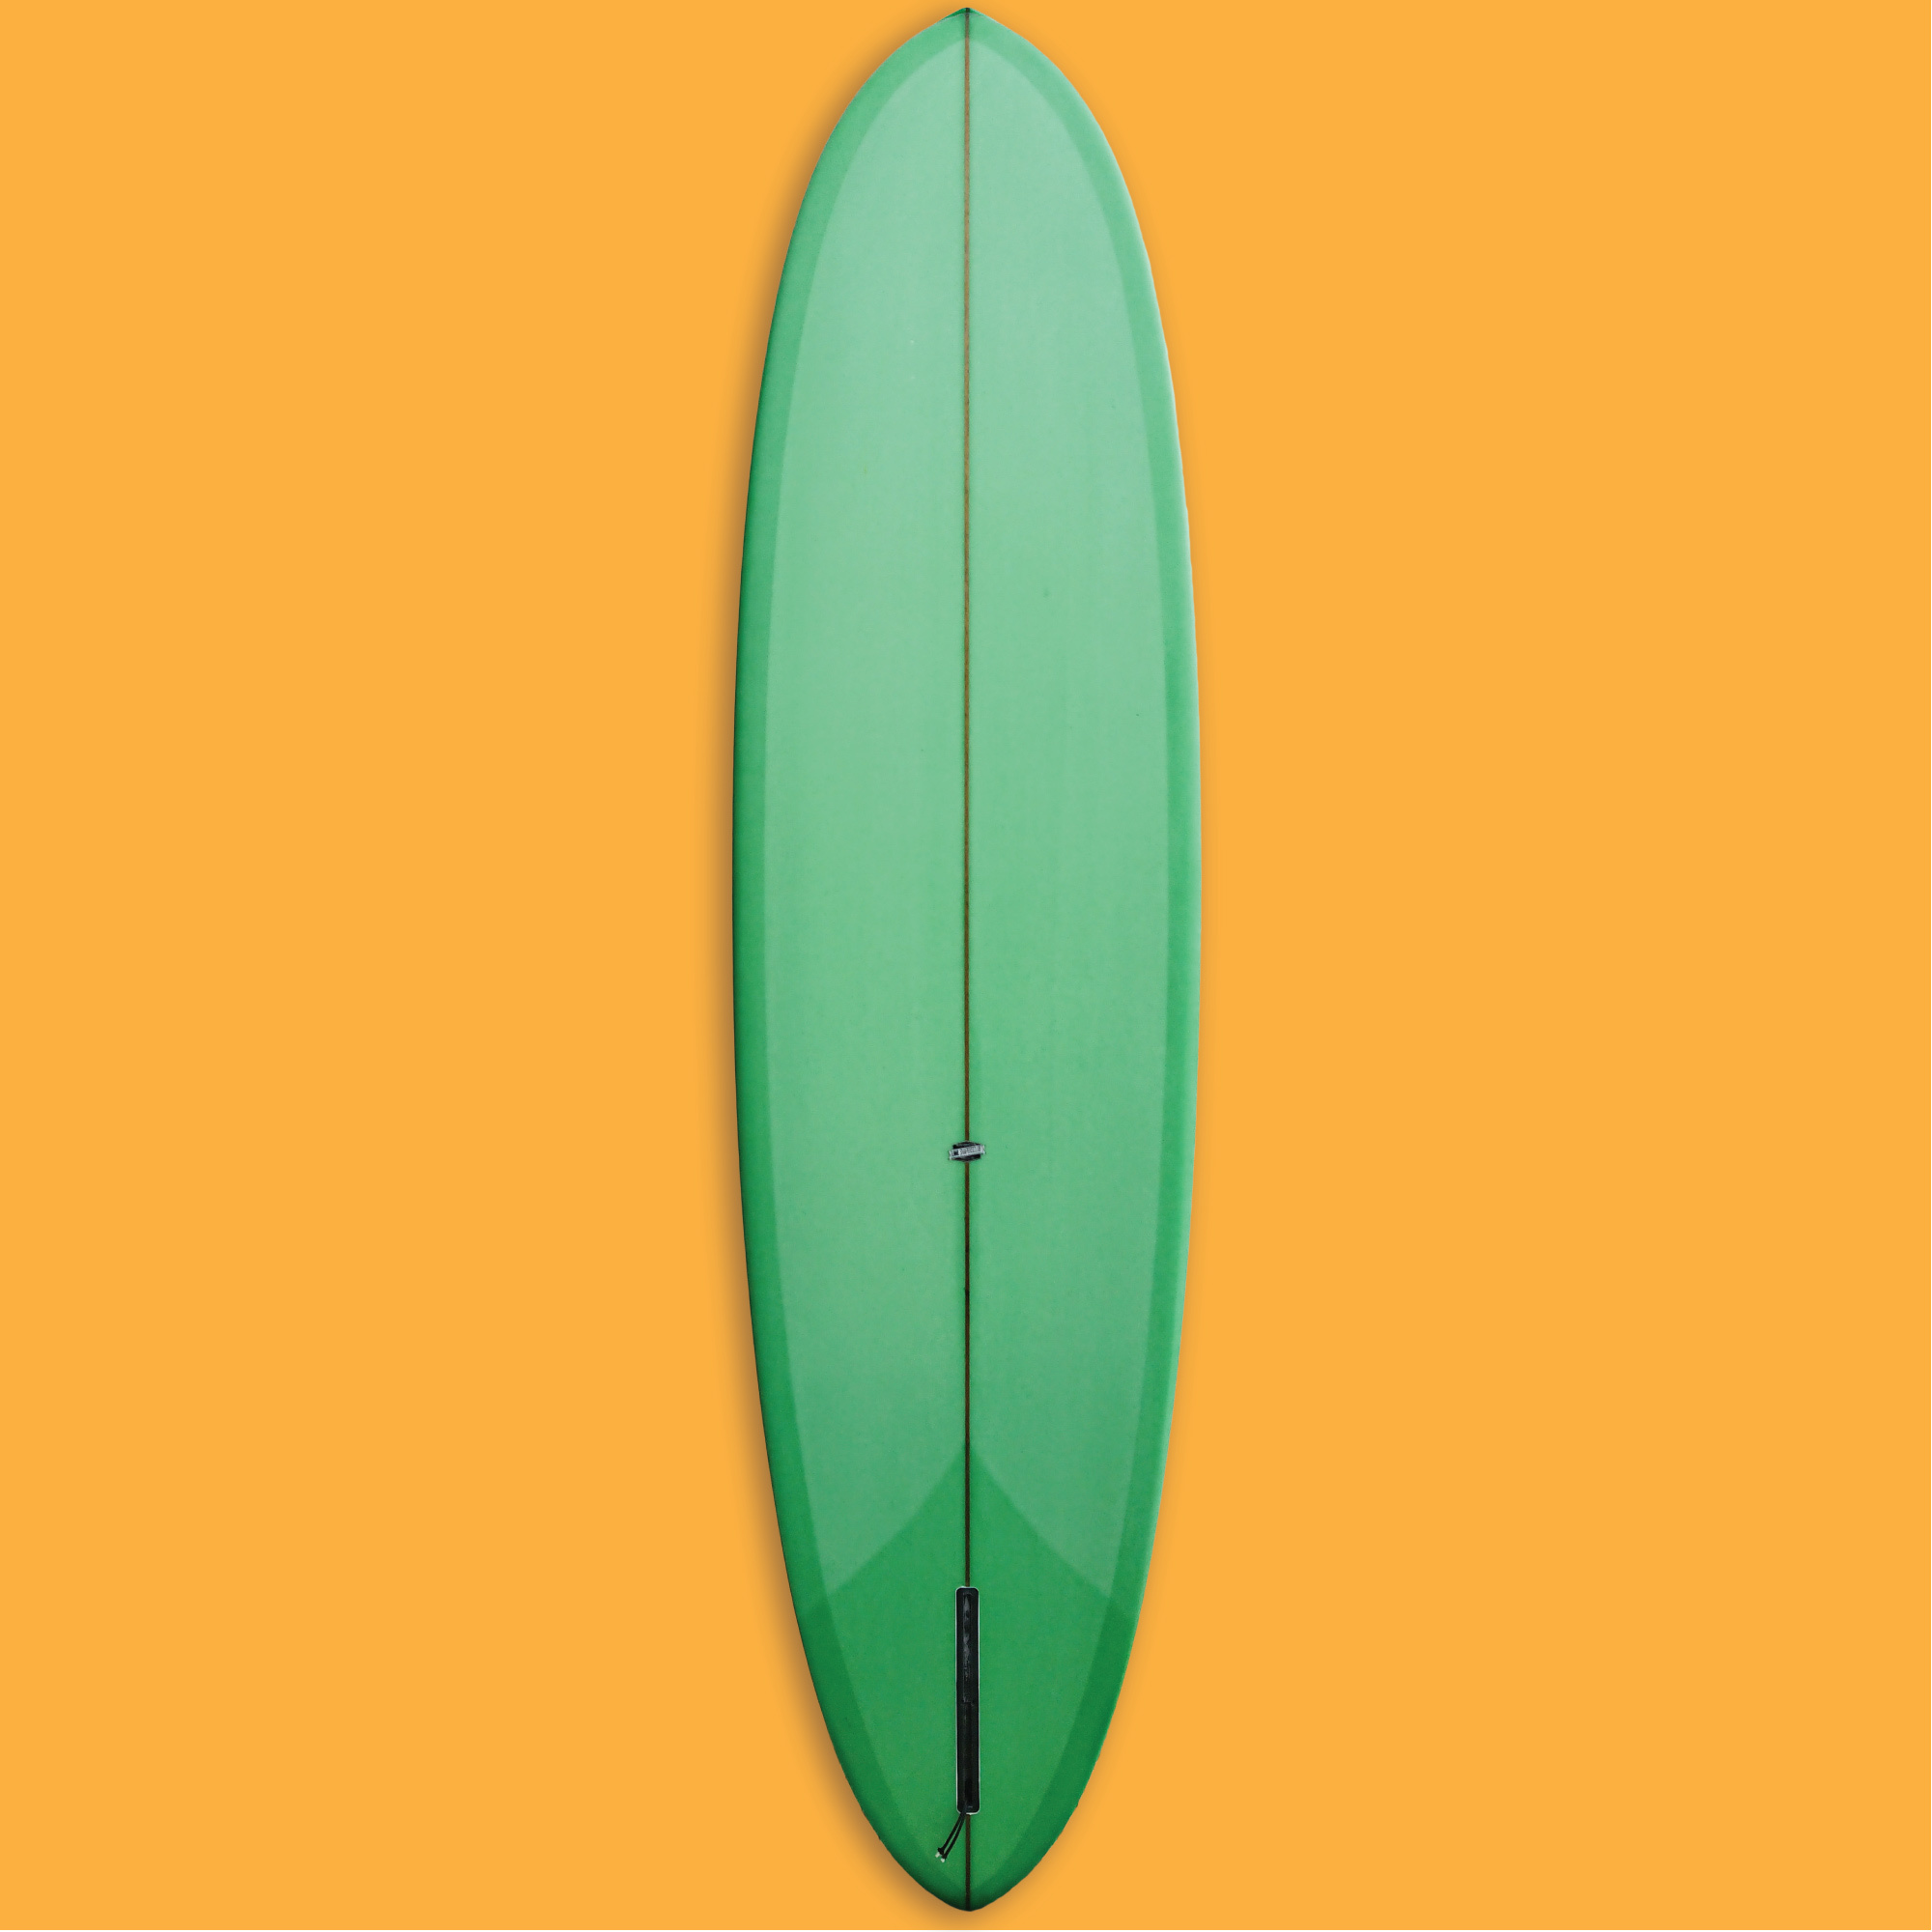 Troy Elmore Eggman 7'4 green